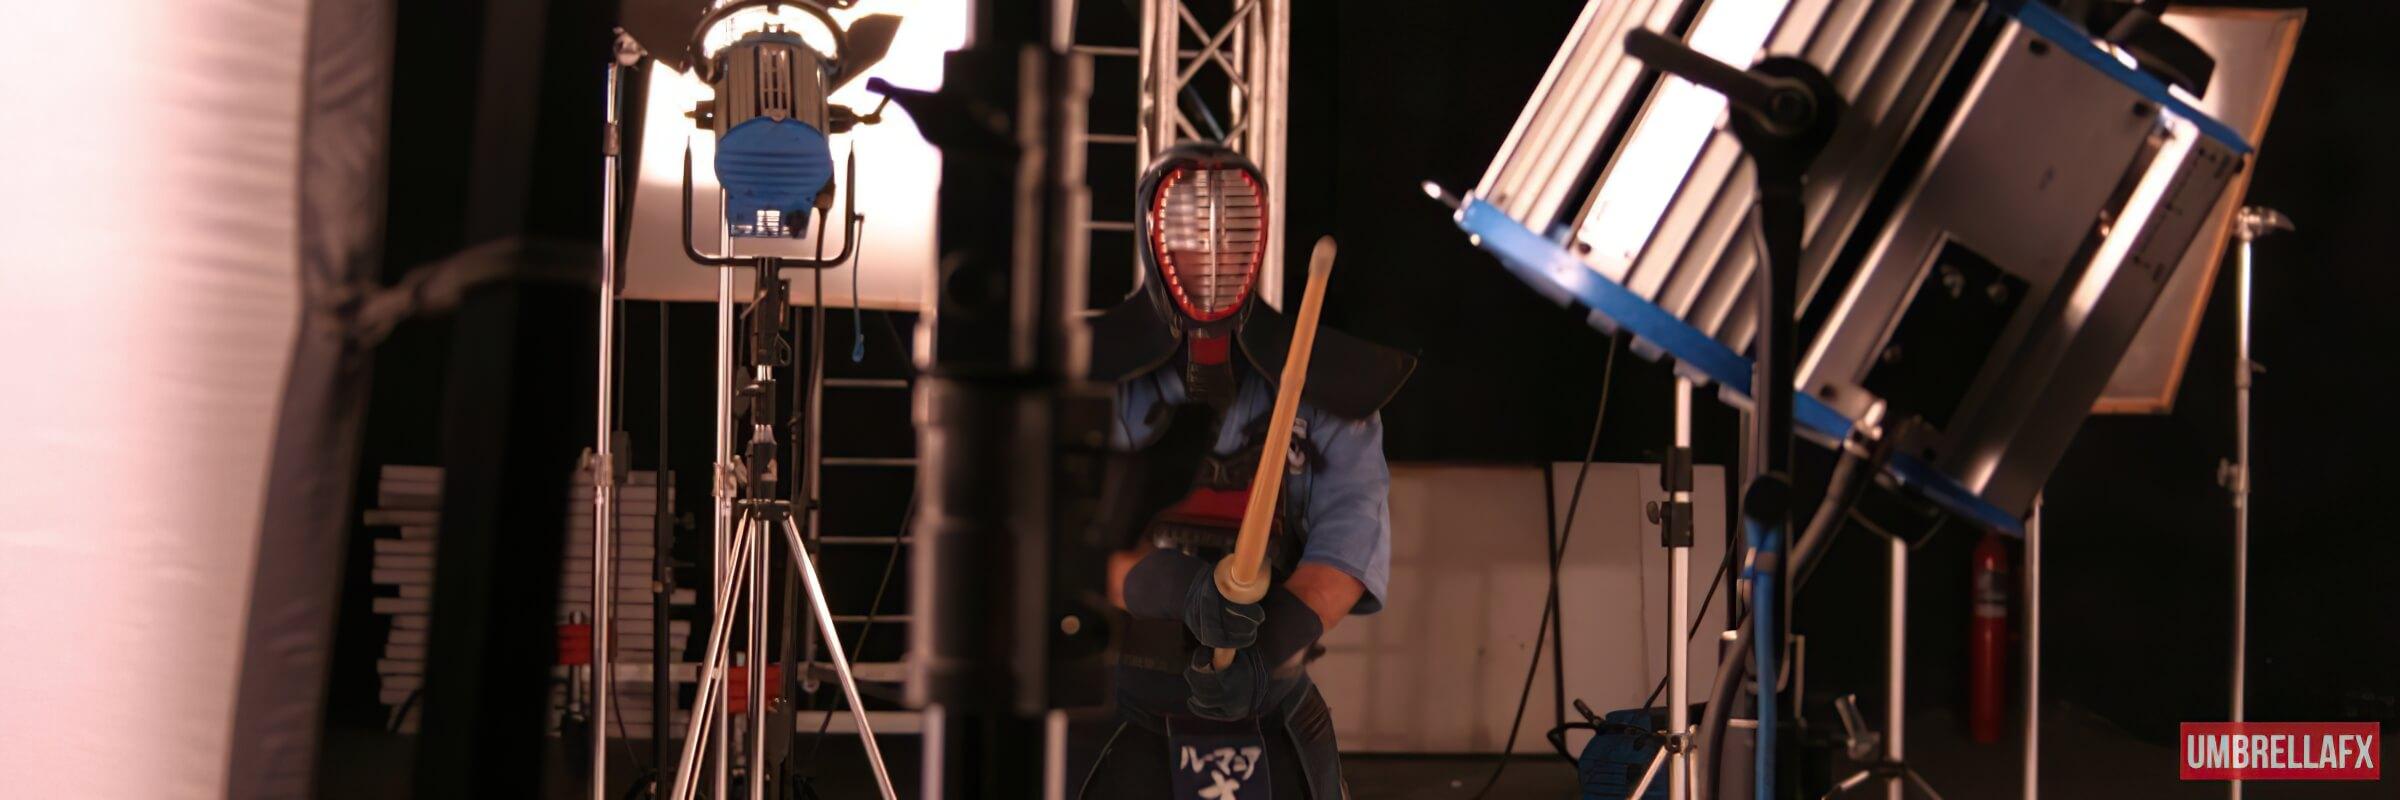 UmbrellaFX_On_the_Set_Boom_Action_02-1